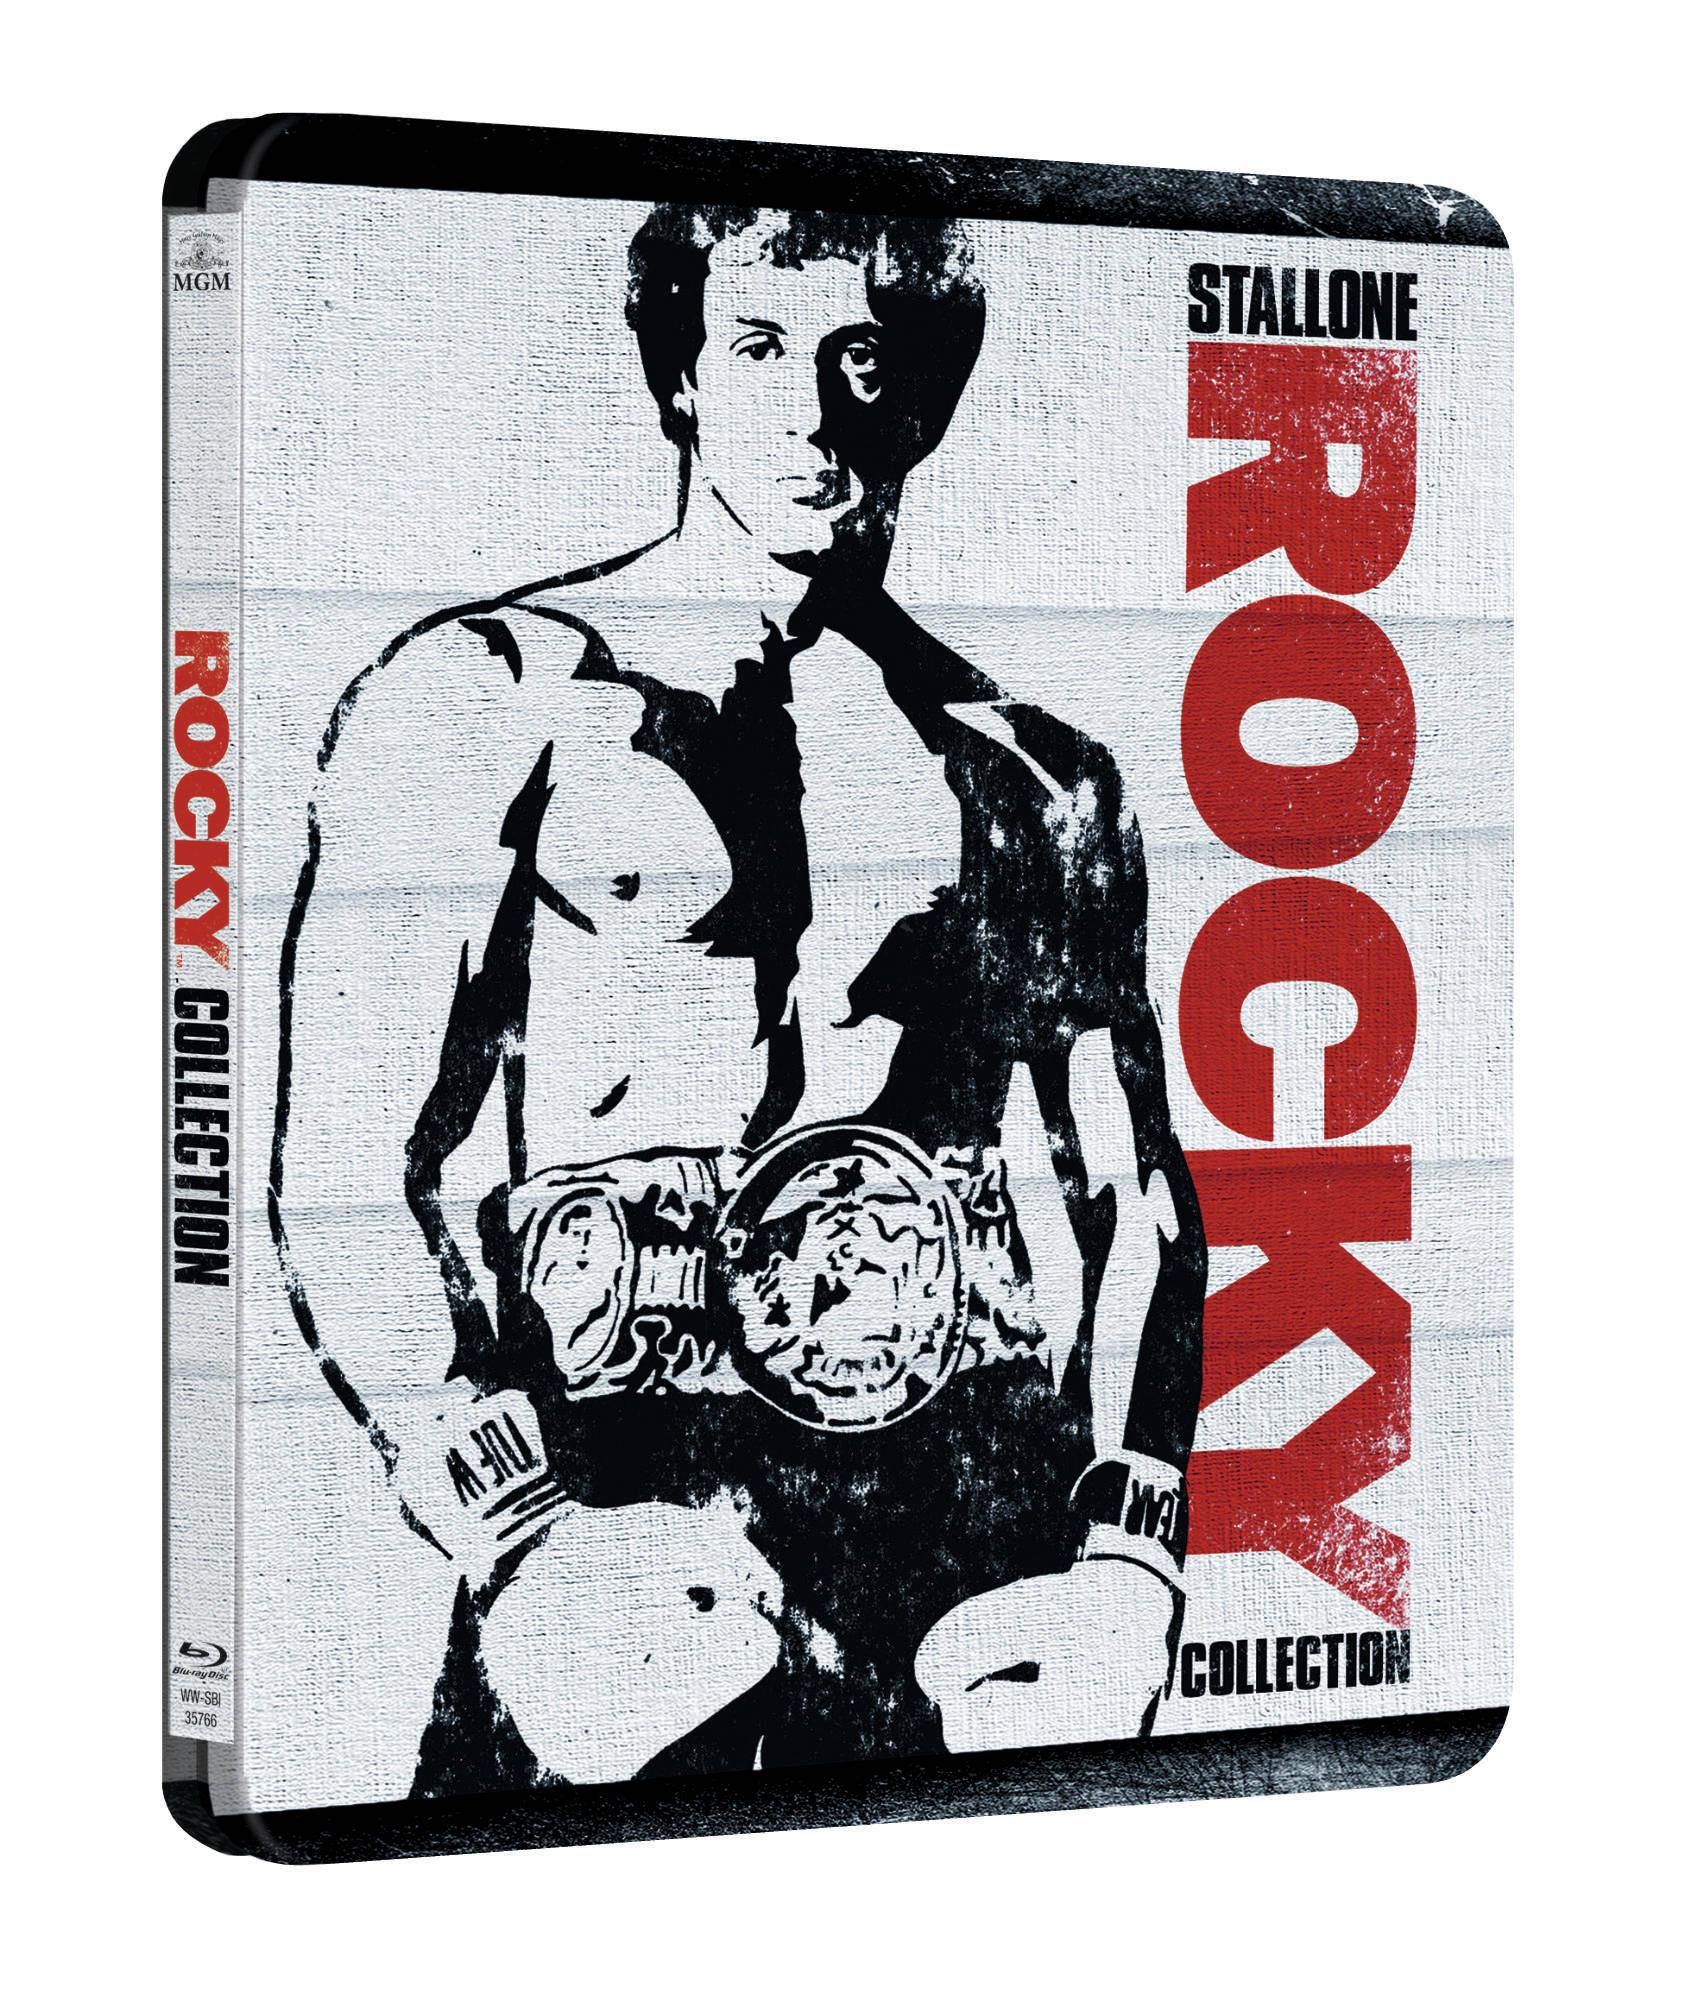 ROCKY COLLECTION 1-6 STEELBOOK FINAL 3D PACKSHOT - RGB